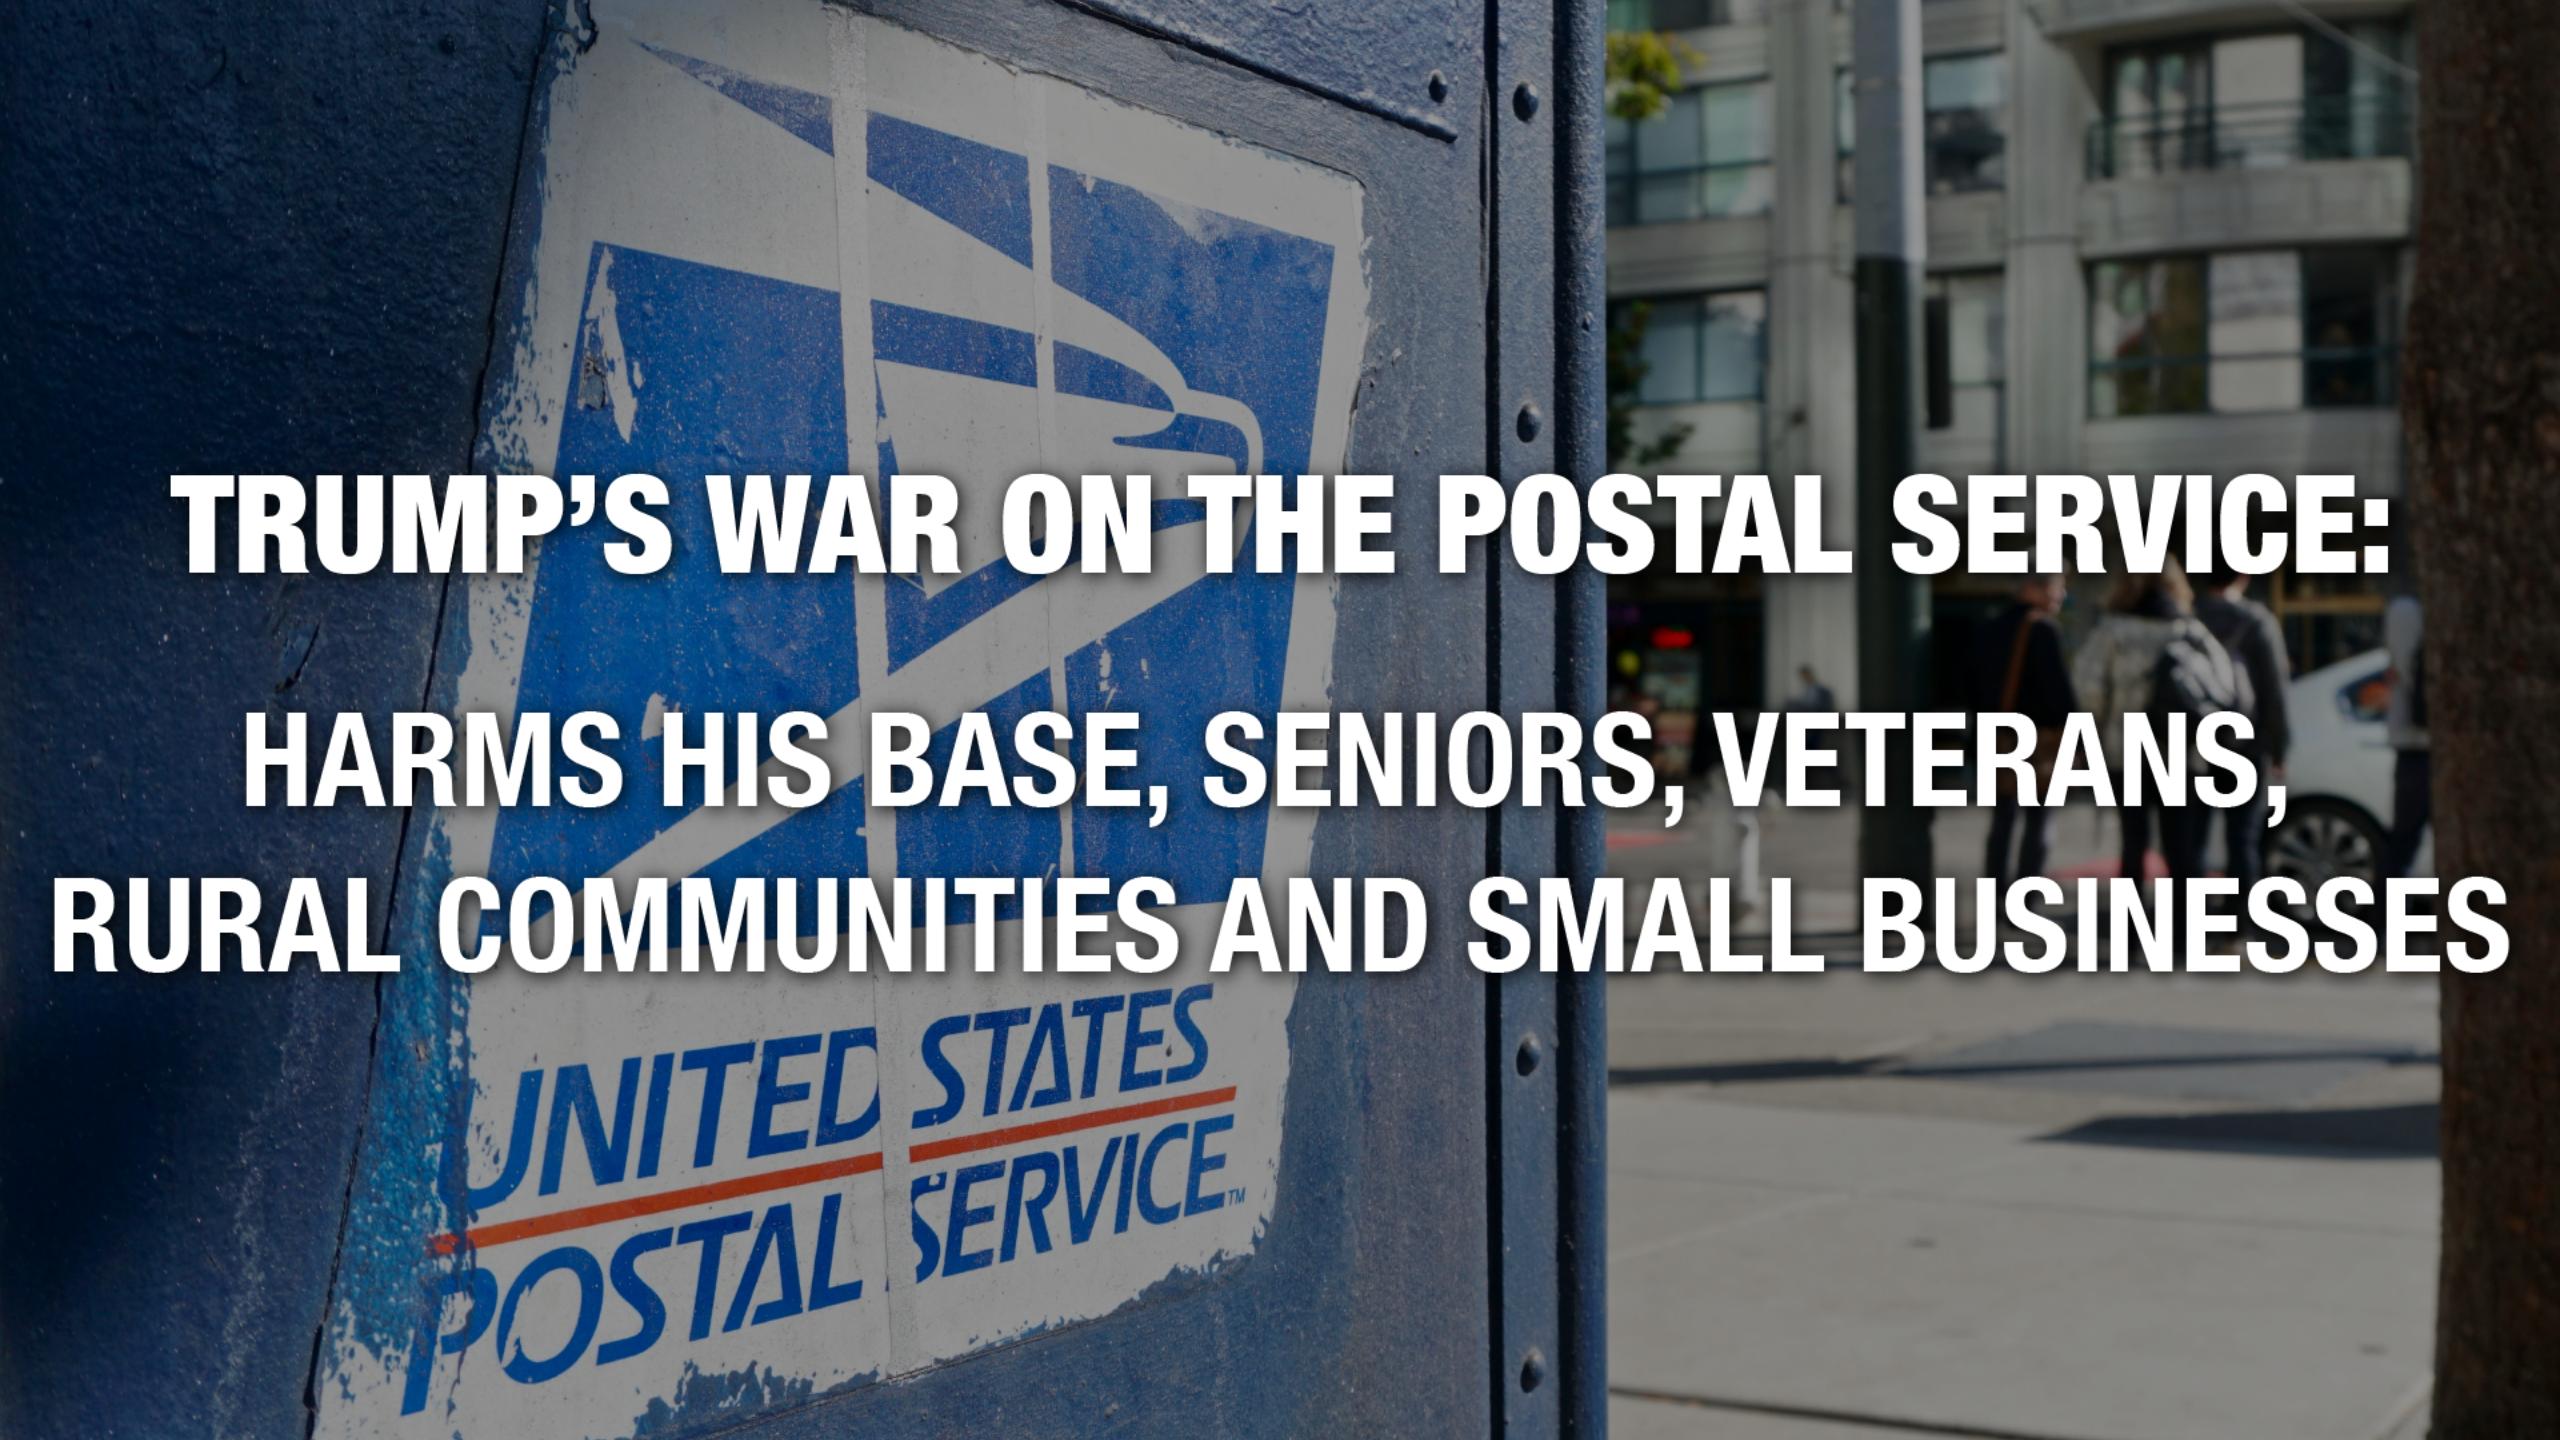 Newsweek AMPLIFY - Trump's War on Postal